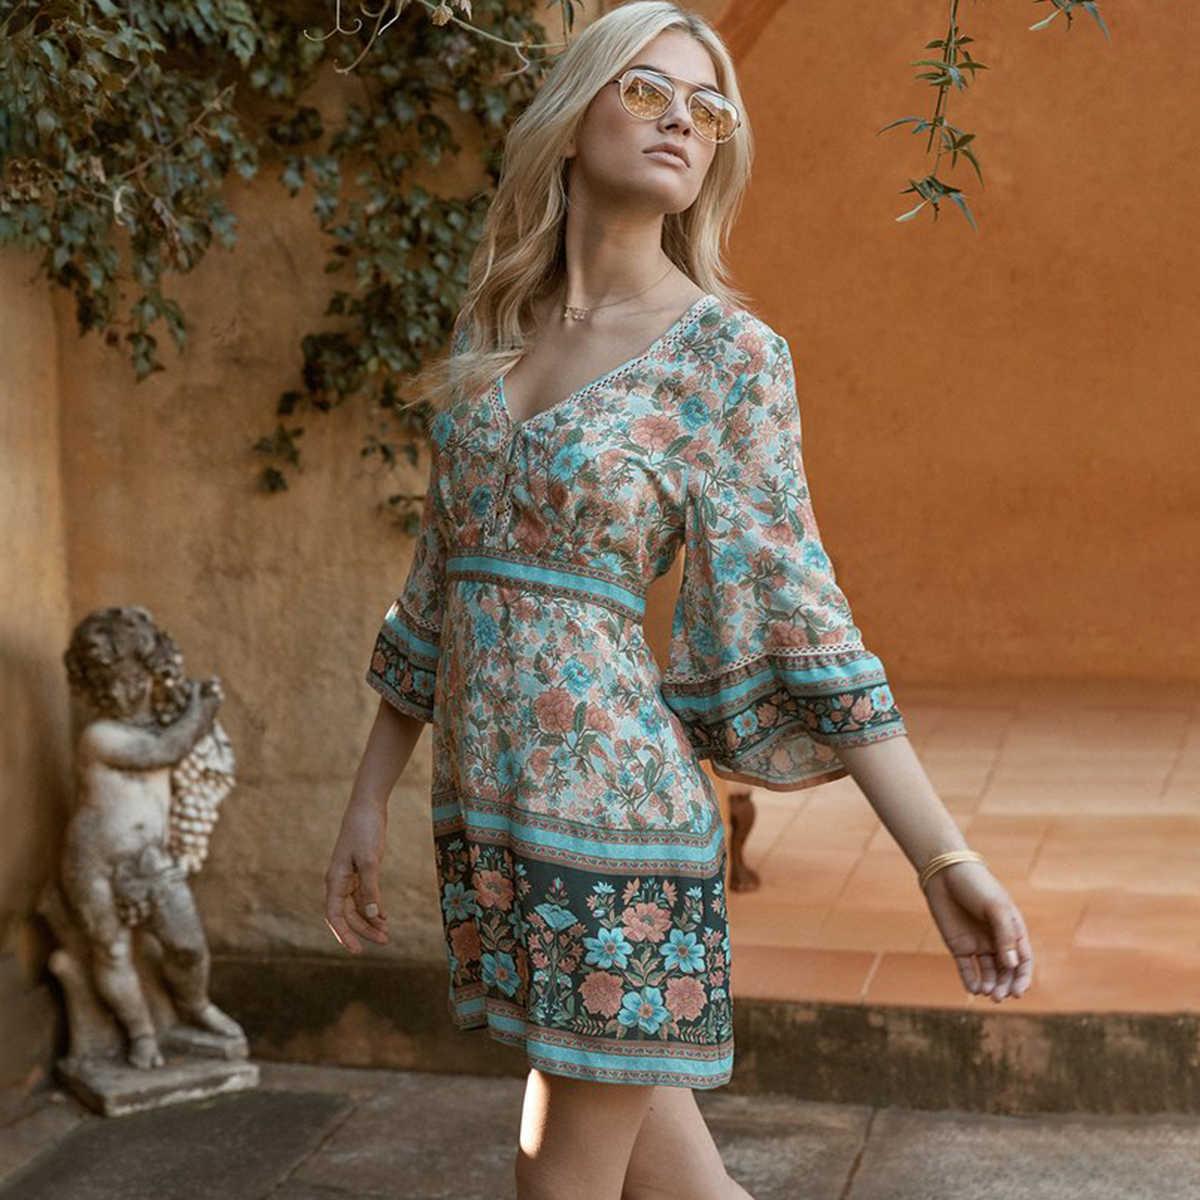 e2415f37dc175 Vintage Chic Floral Long Summer Boho Dress Wrap Bohemian Beach Dress ...